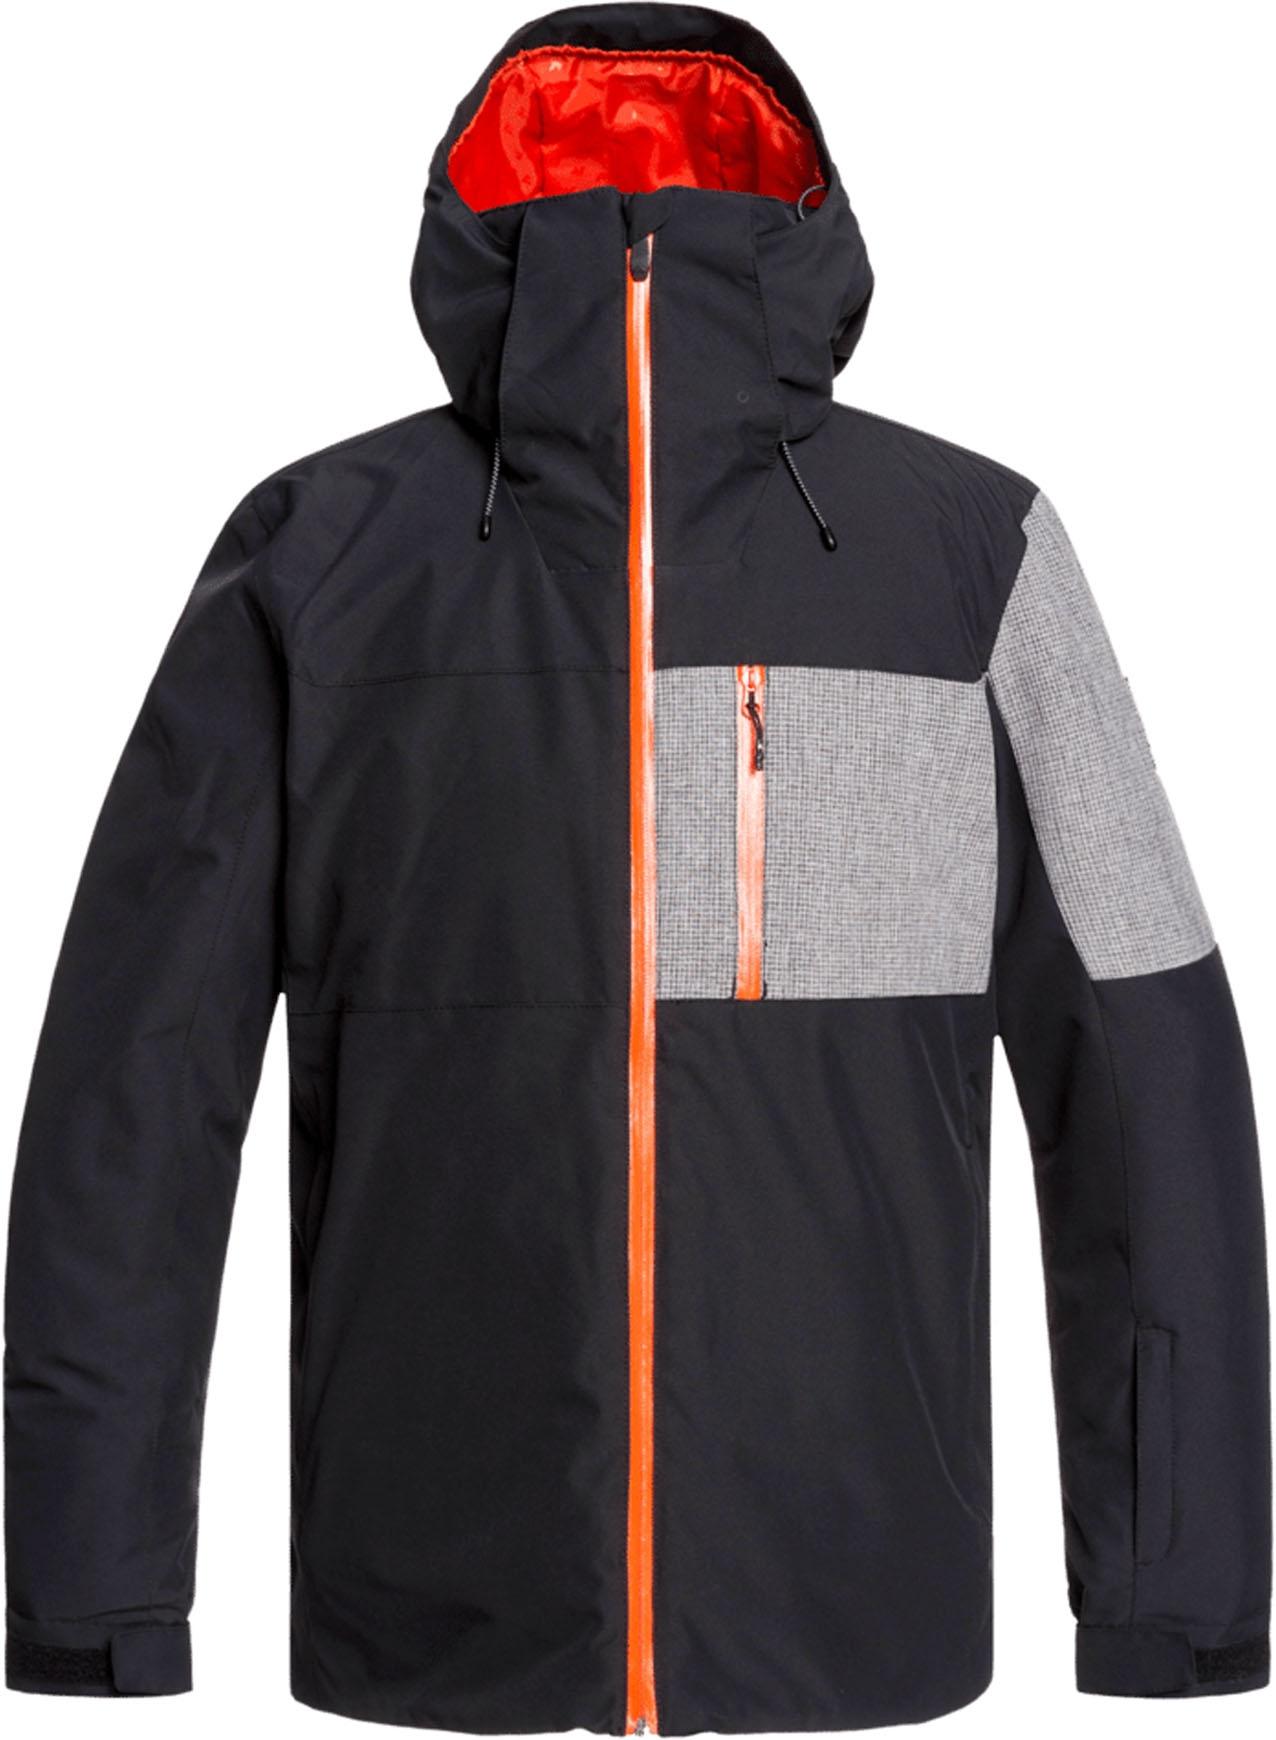 Quiksilver Anniversary Jacket Black : Skijacken : Snowleader